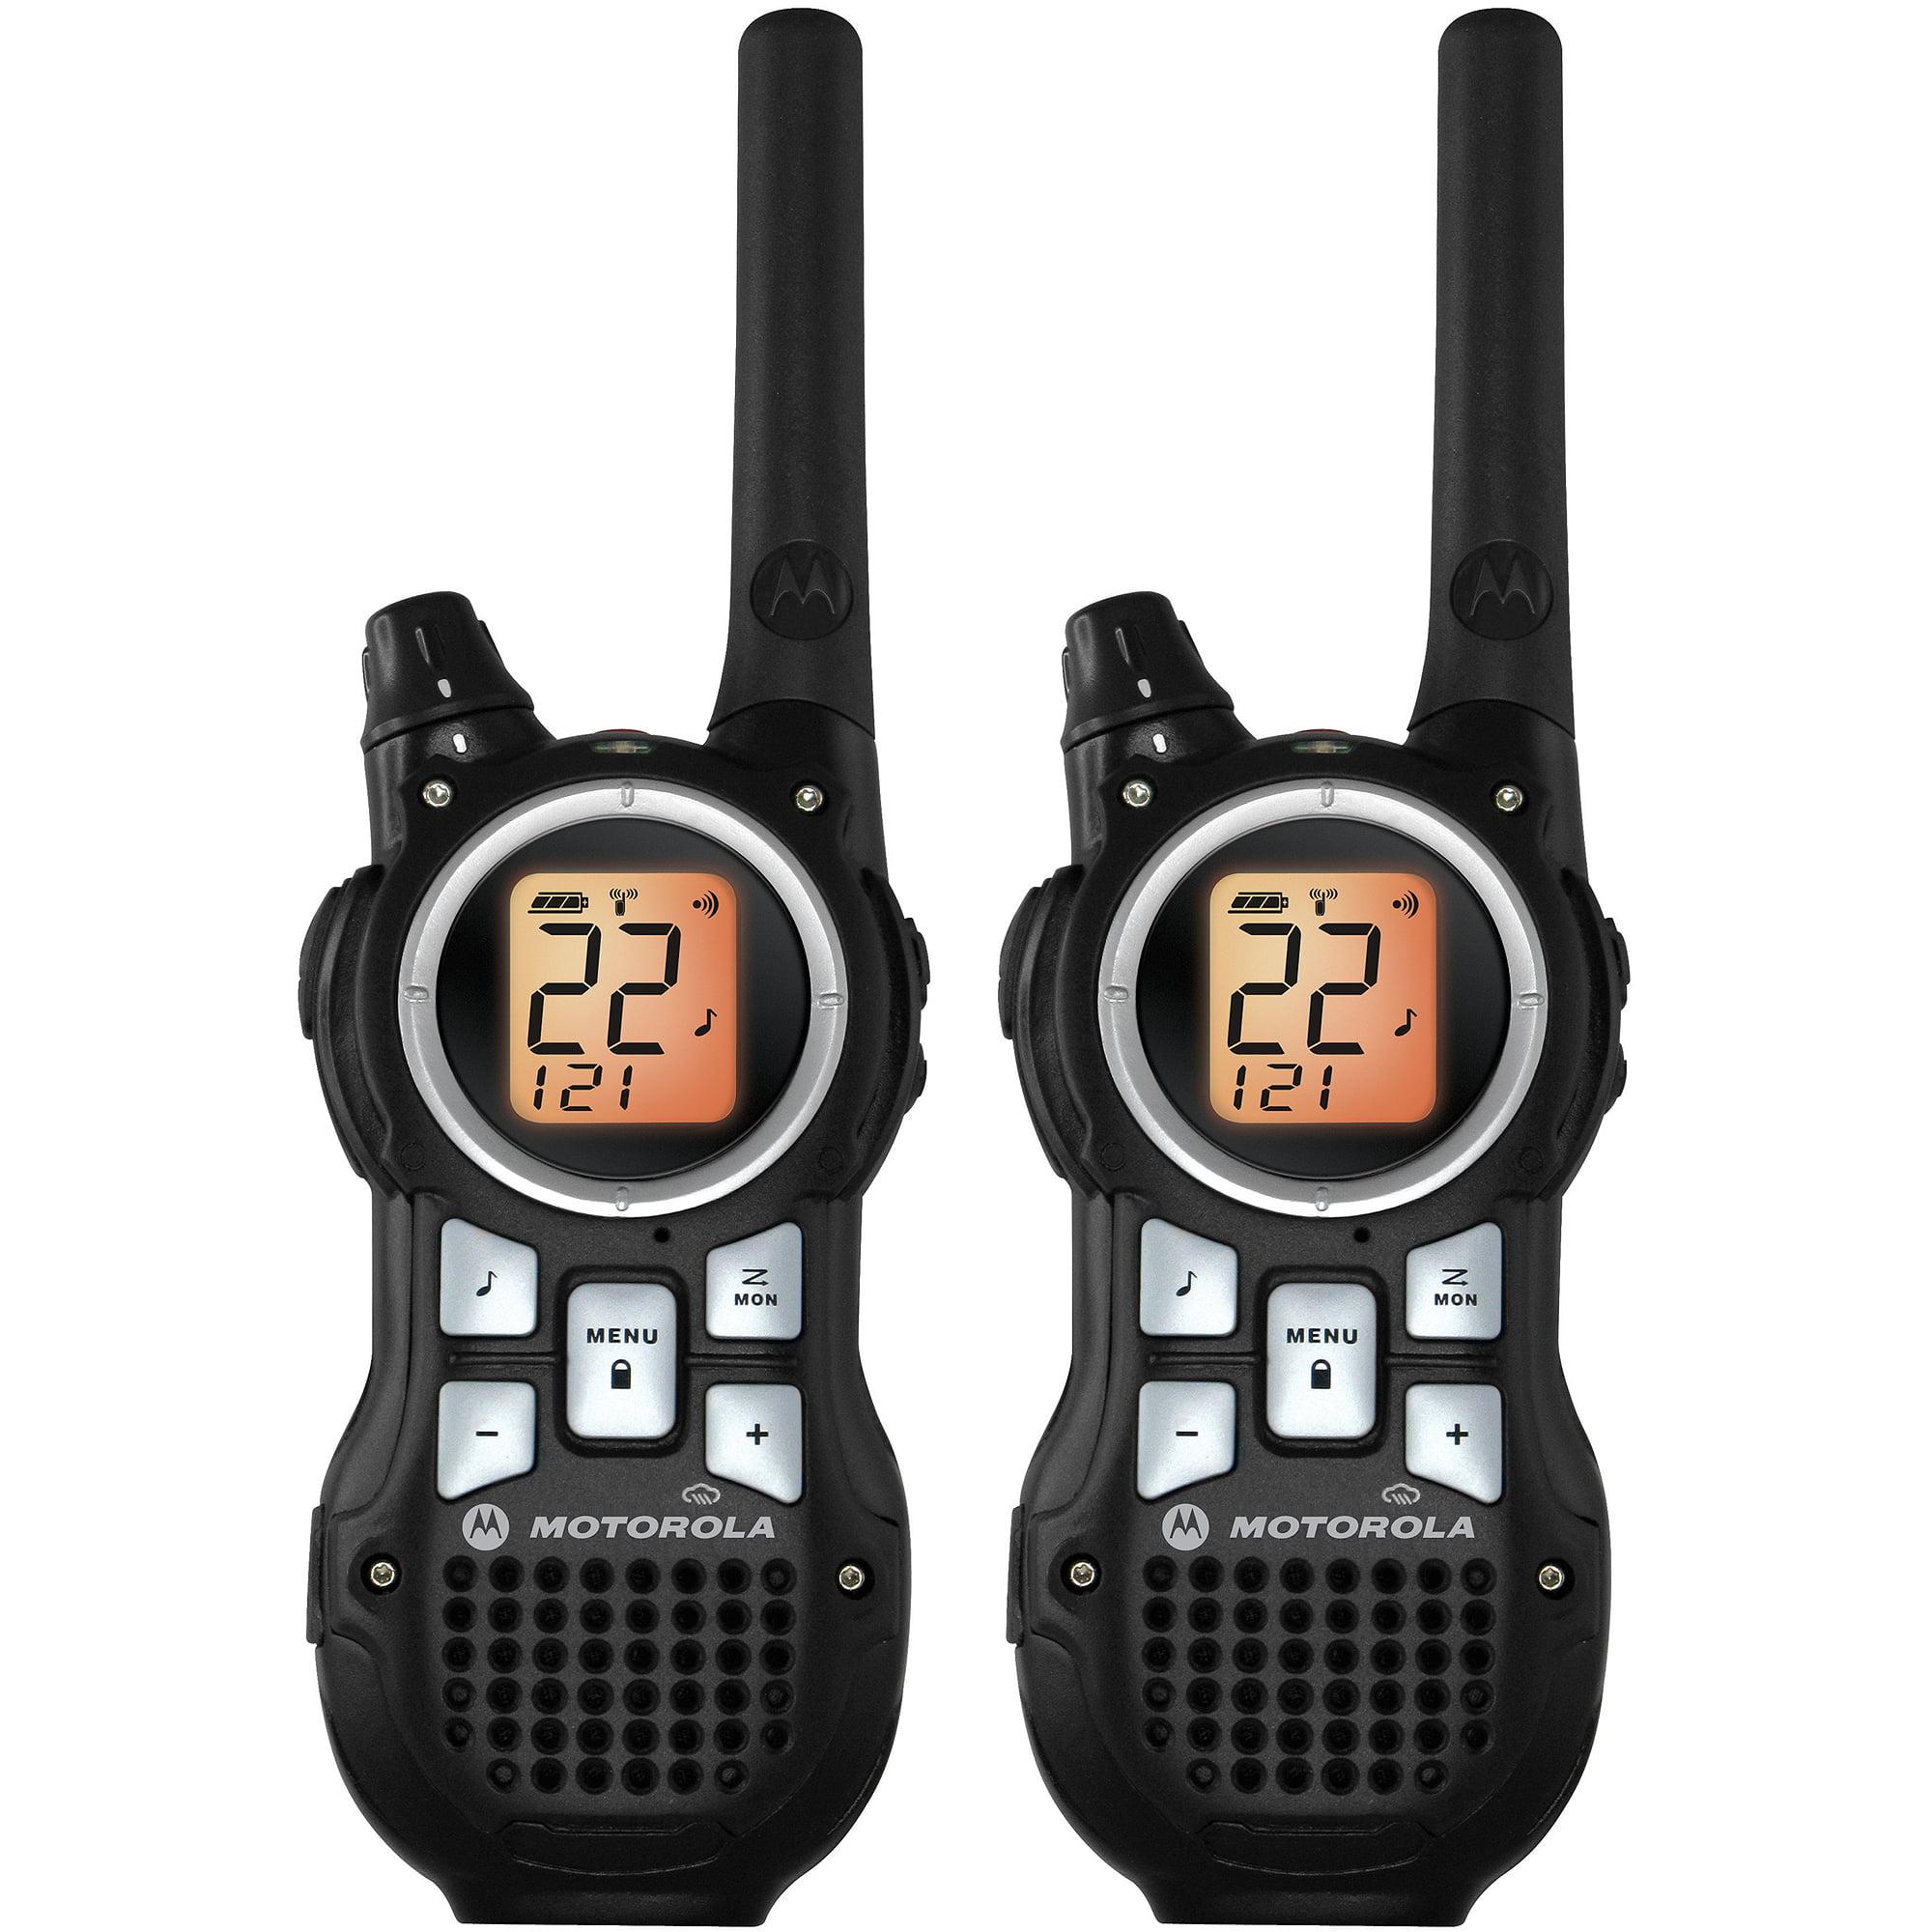 Motorola MR350R - 35 Mile Range Talkabout 2-Way Radios, PAIR